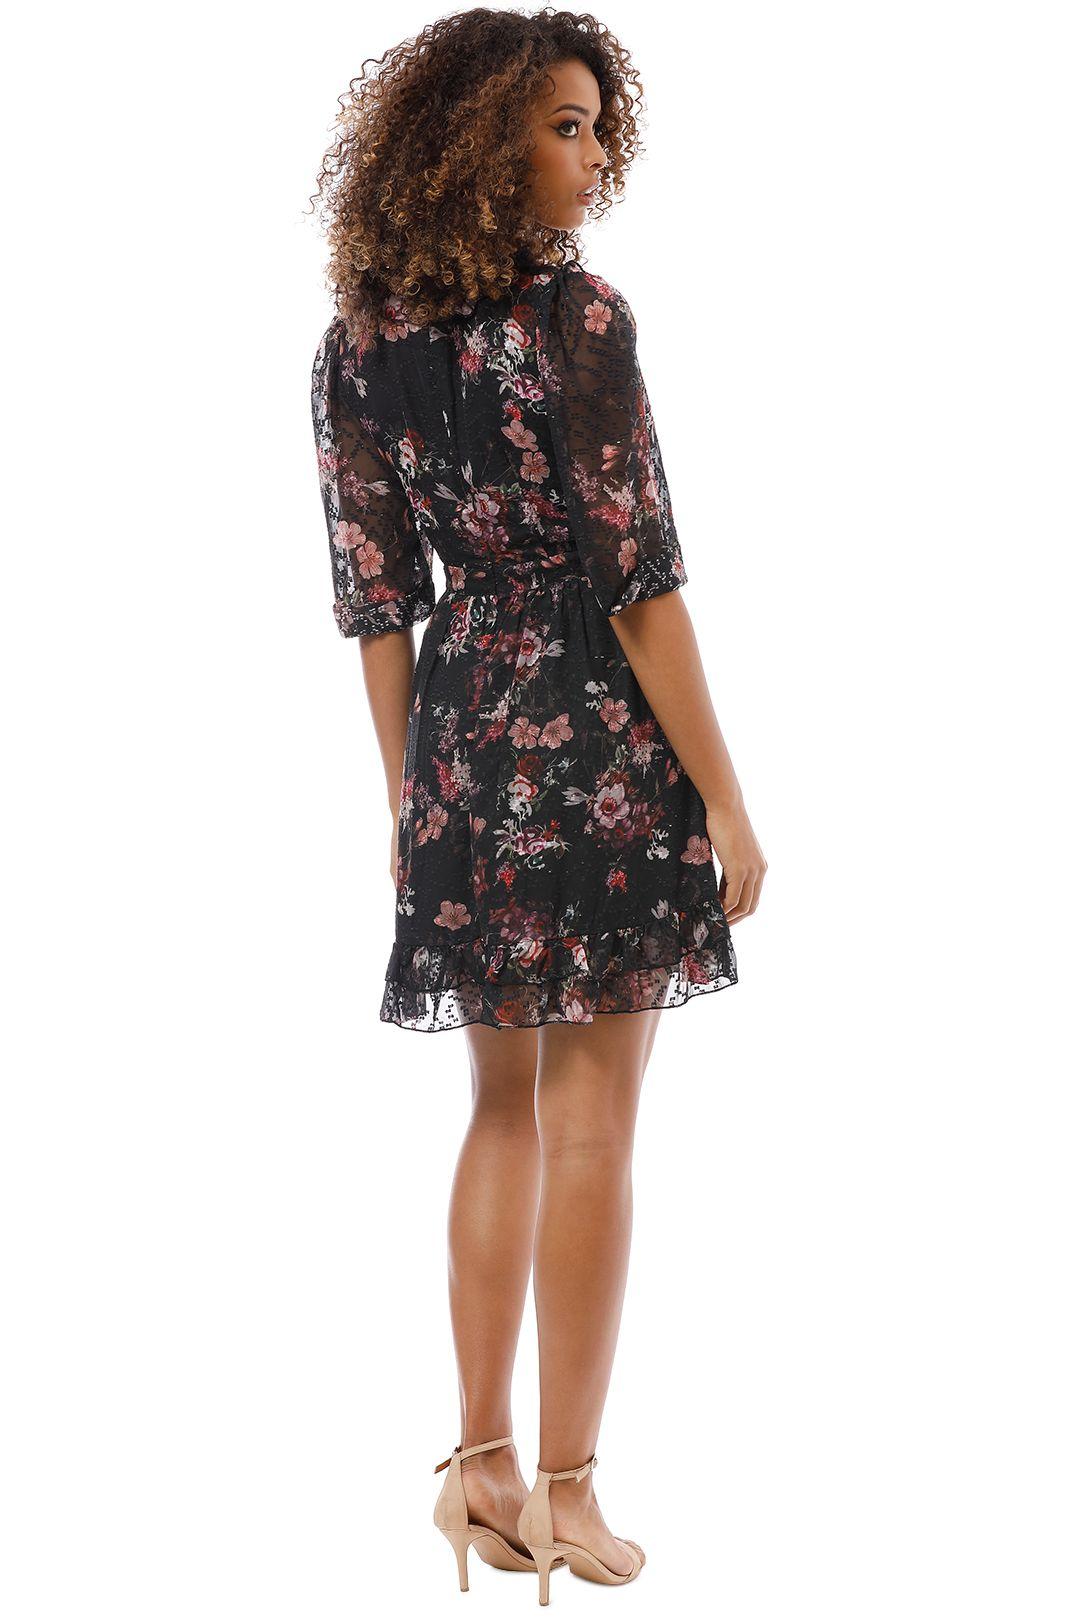 We Are Kindred - Aurelie Mini Dress - Midnight Garden - Back